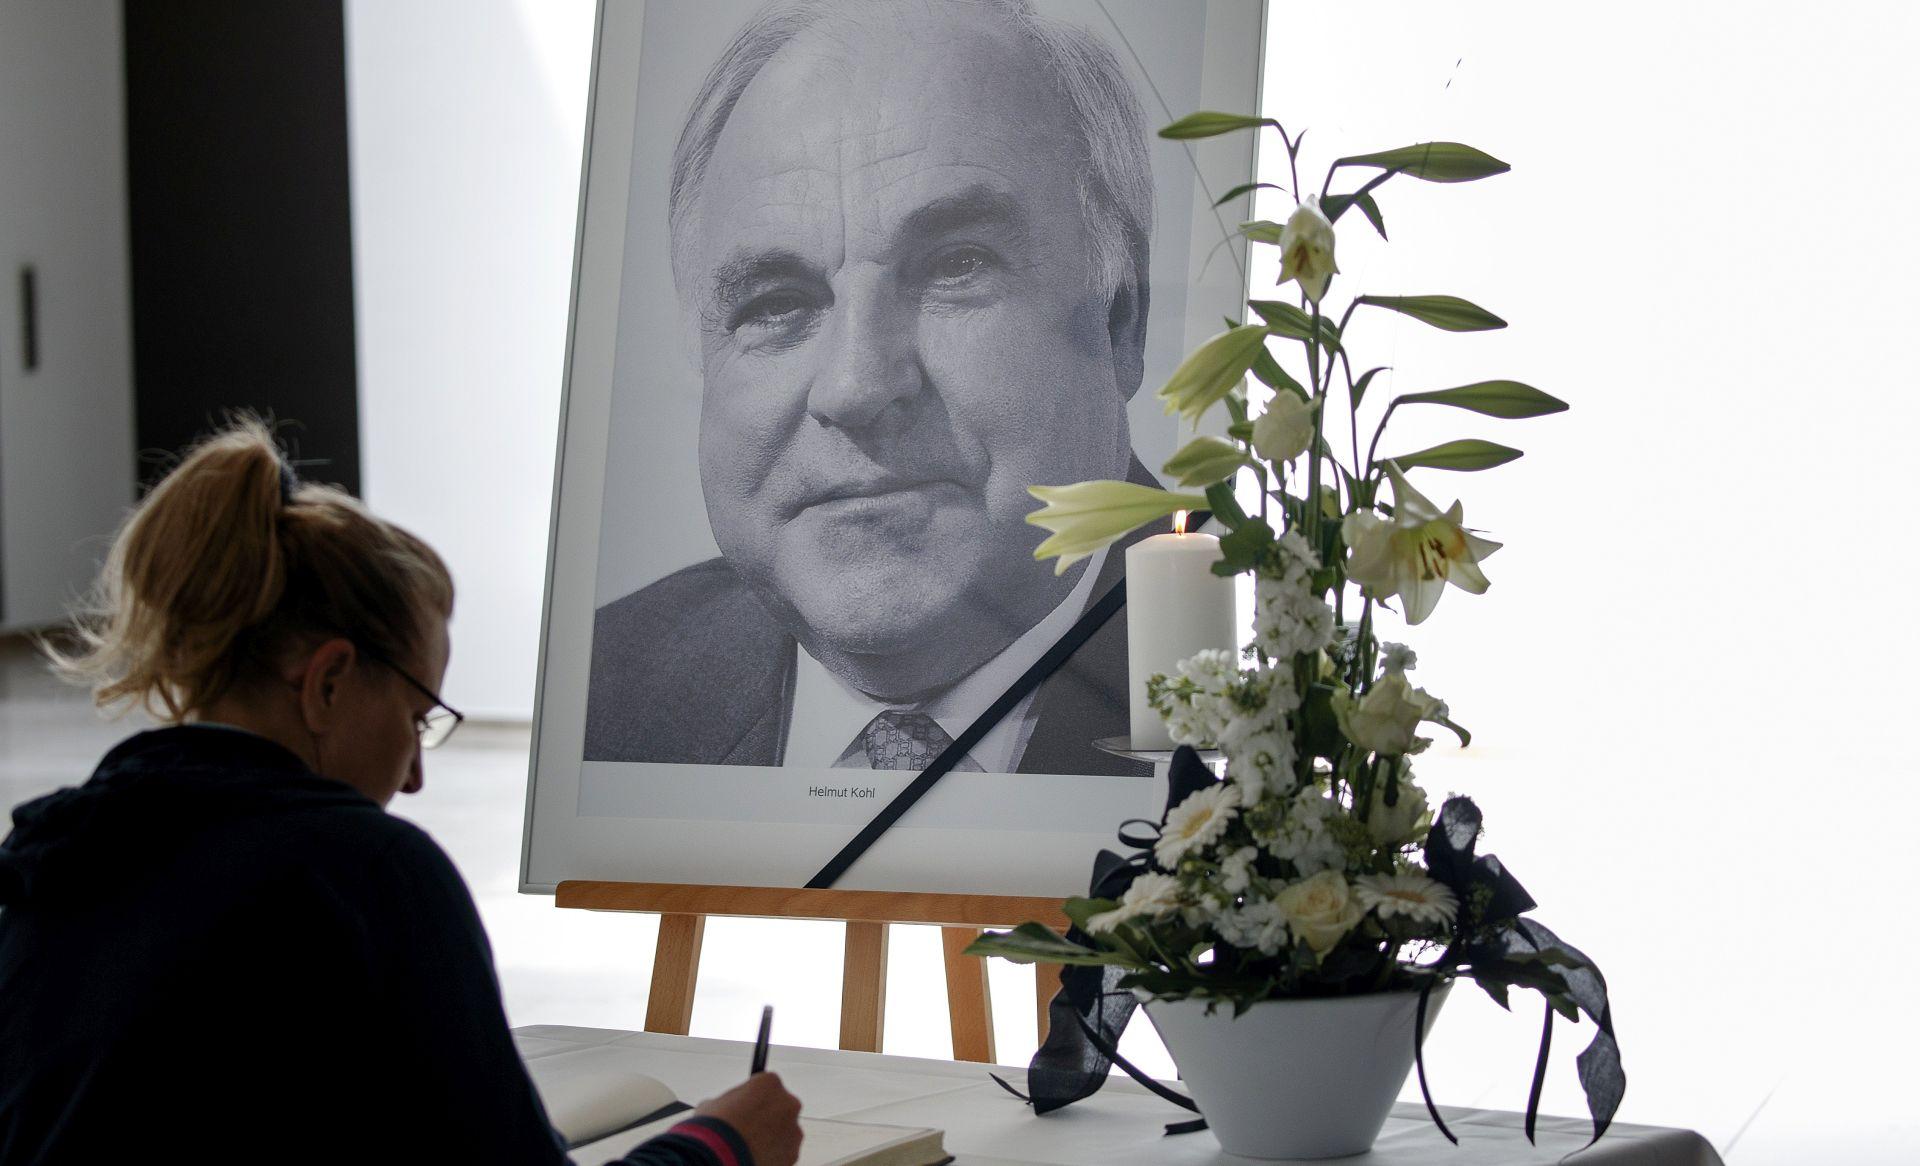 Njemačka žali za Helmutom Kohlom